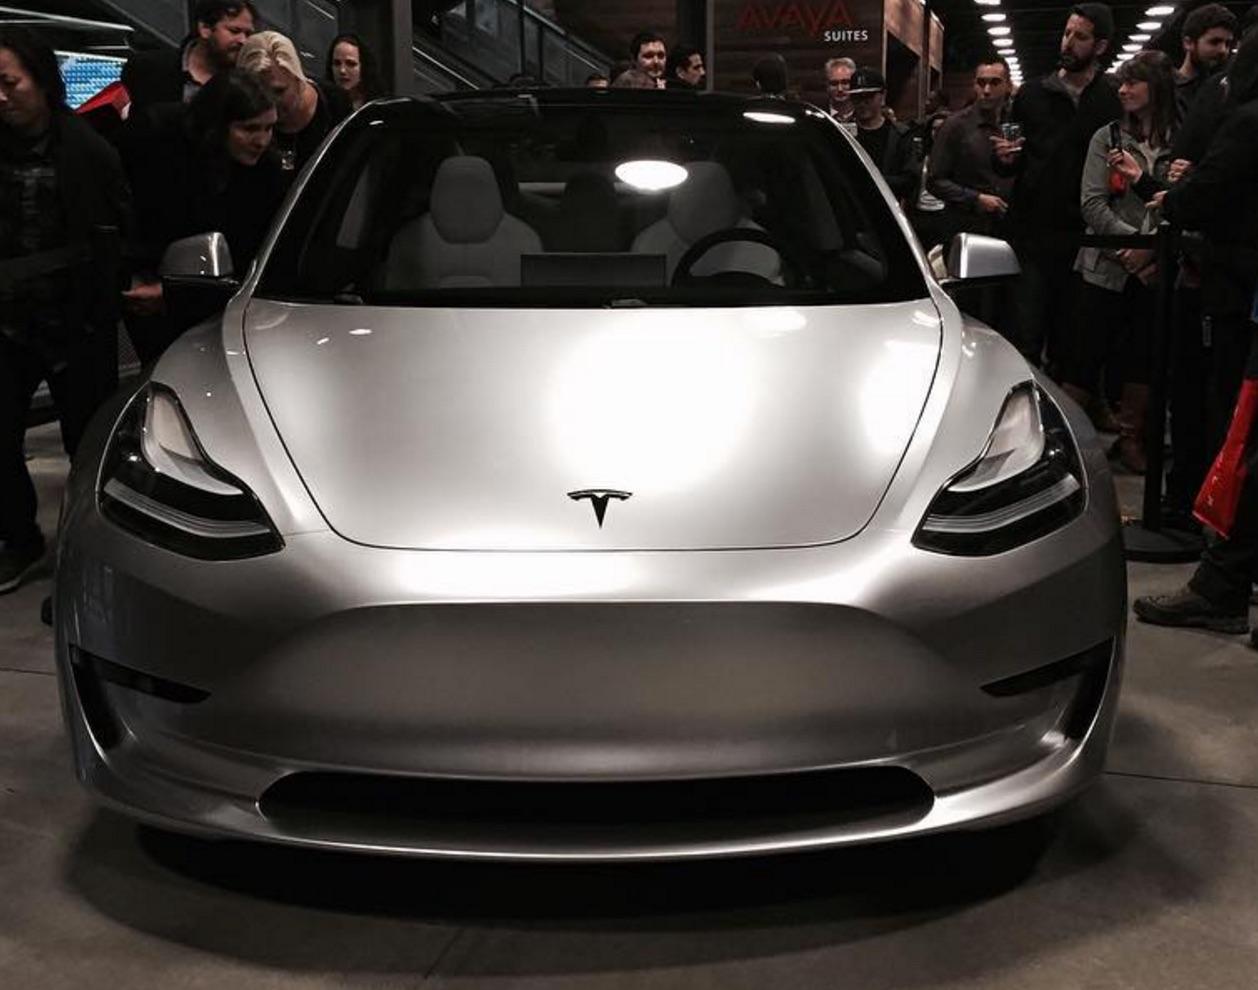 Silver Tesla Model 3 Front Corner At The Avaya Stadium Nov 5 2016